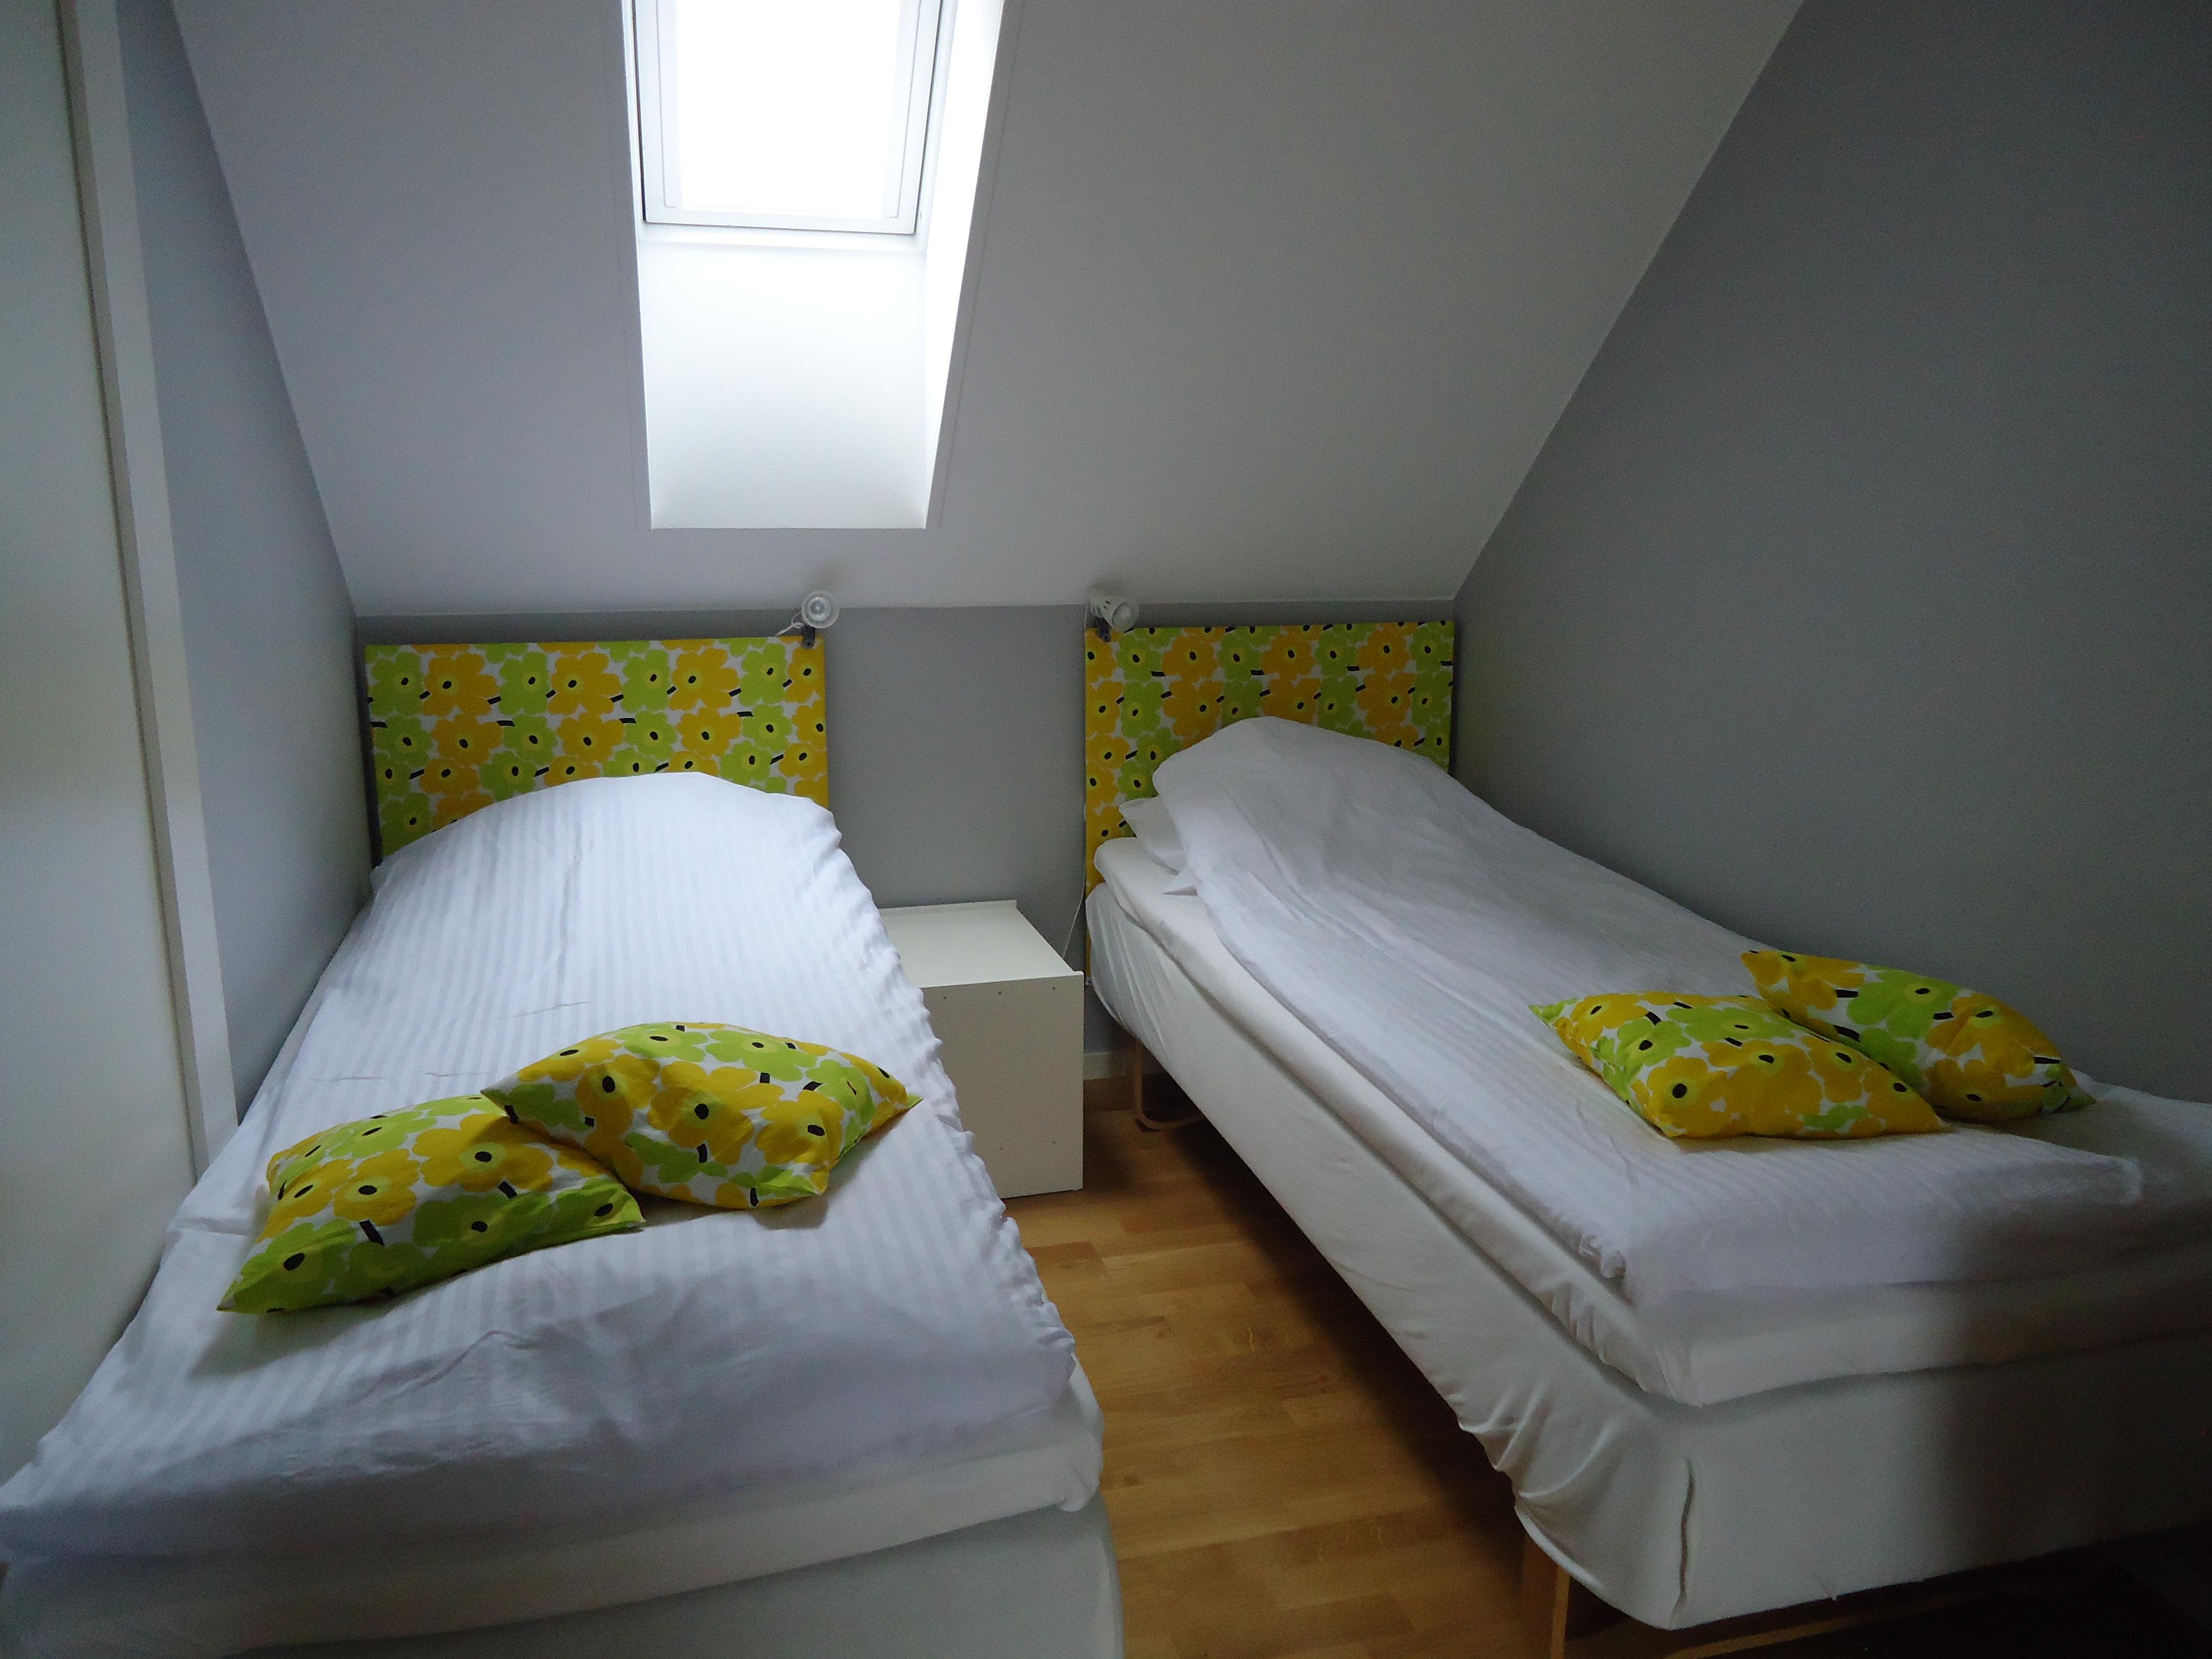 Sängar gula rummet